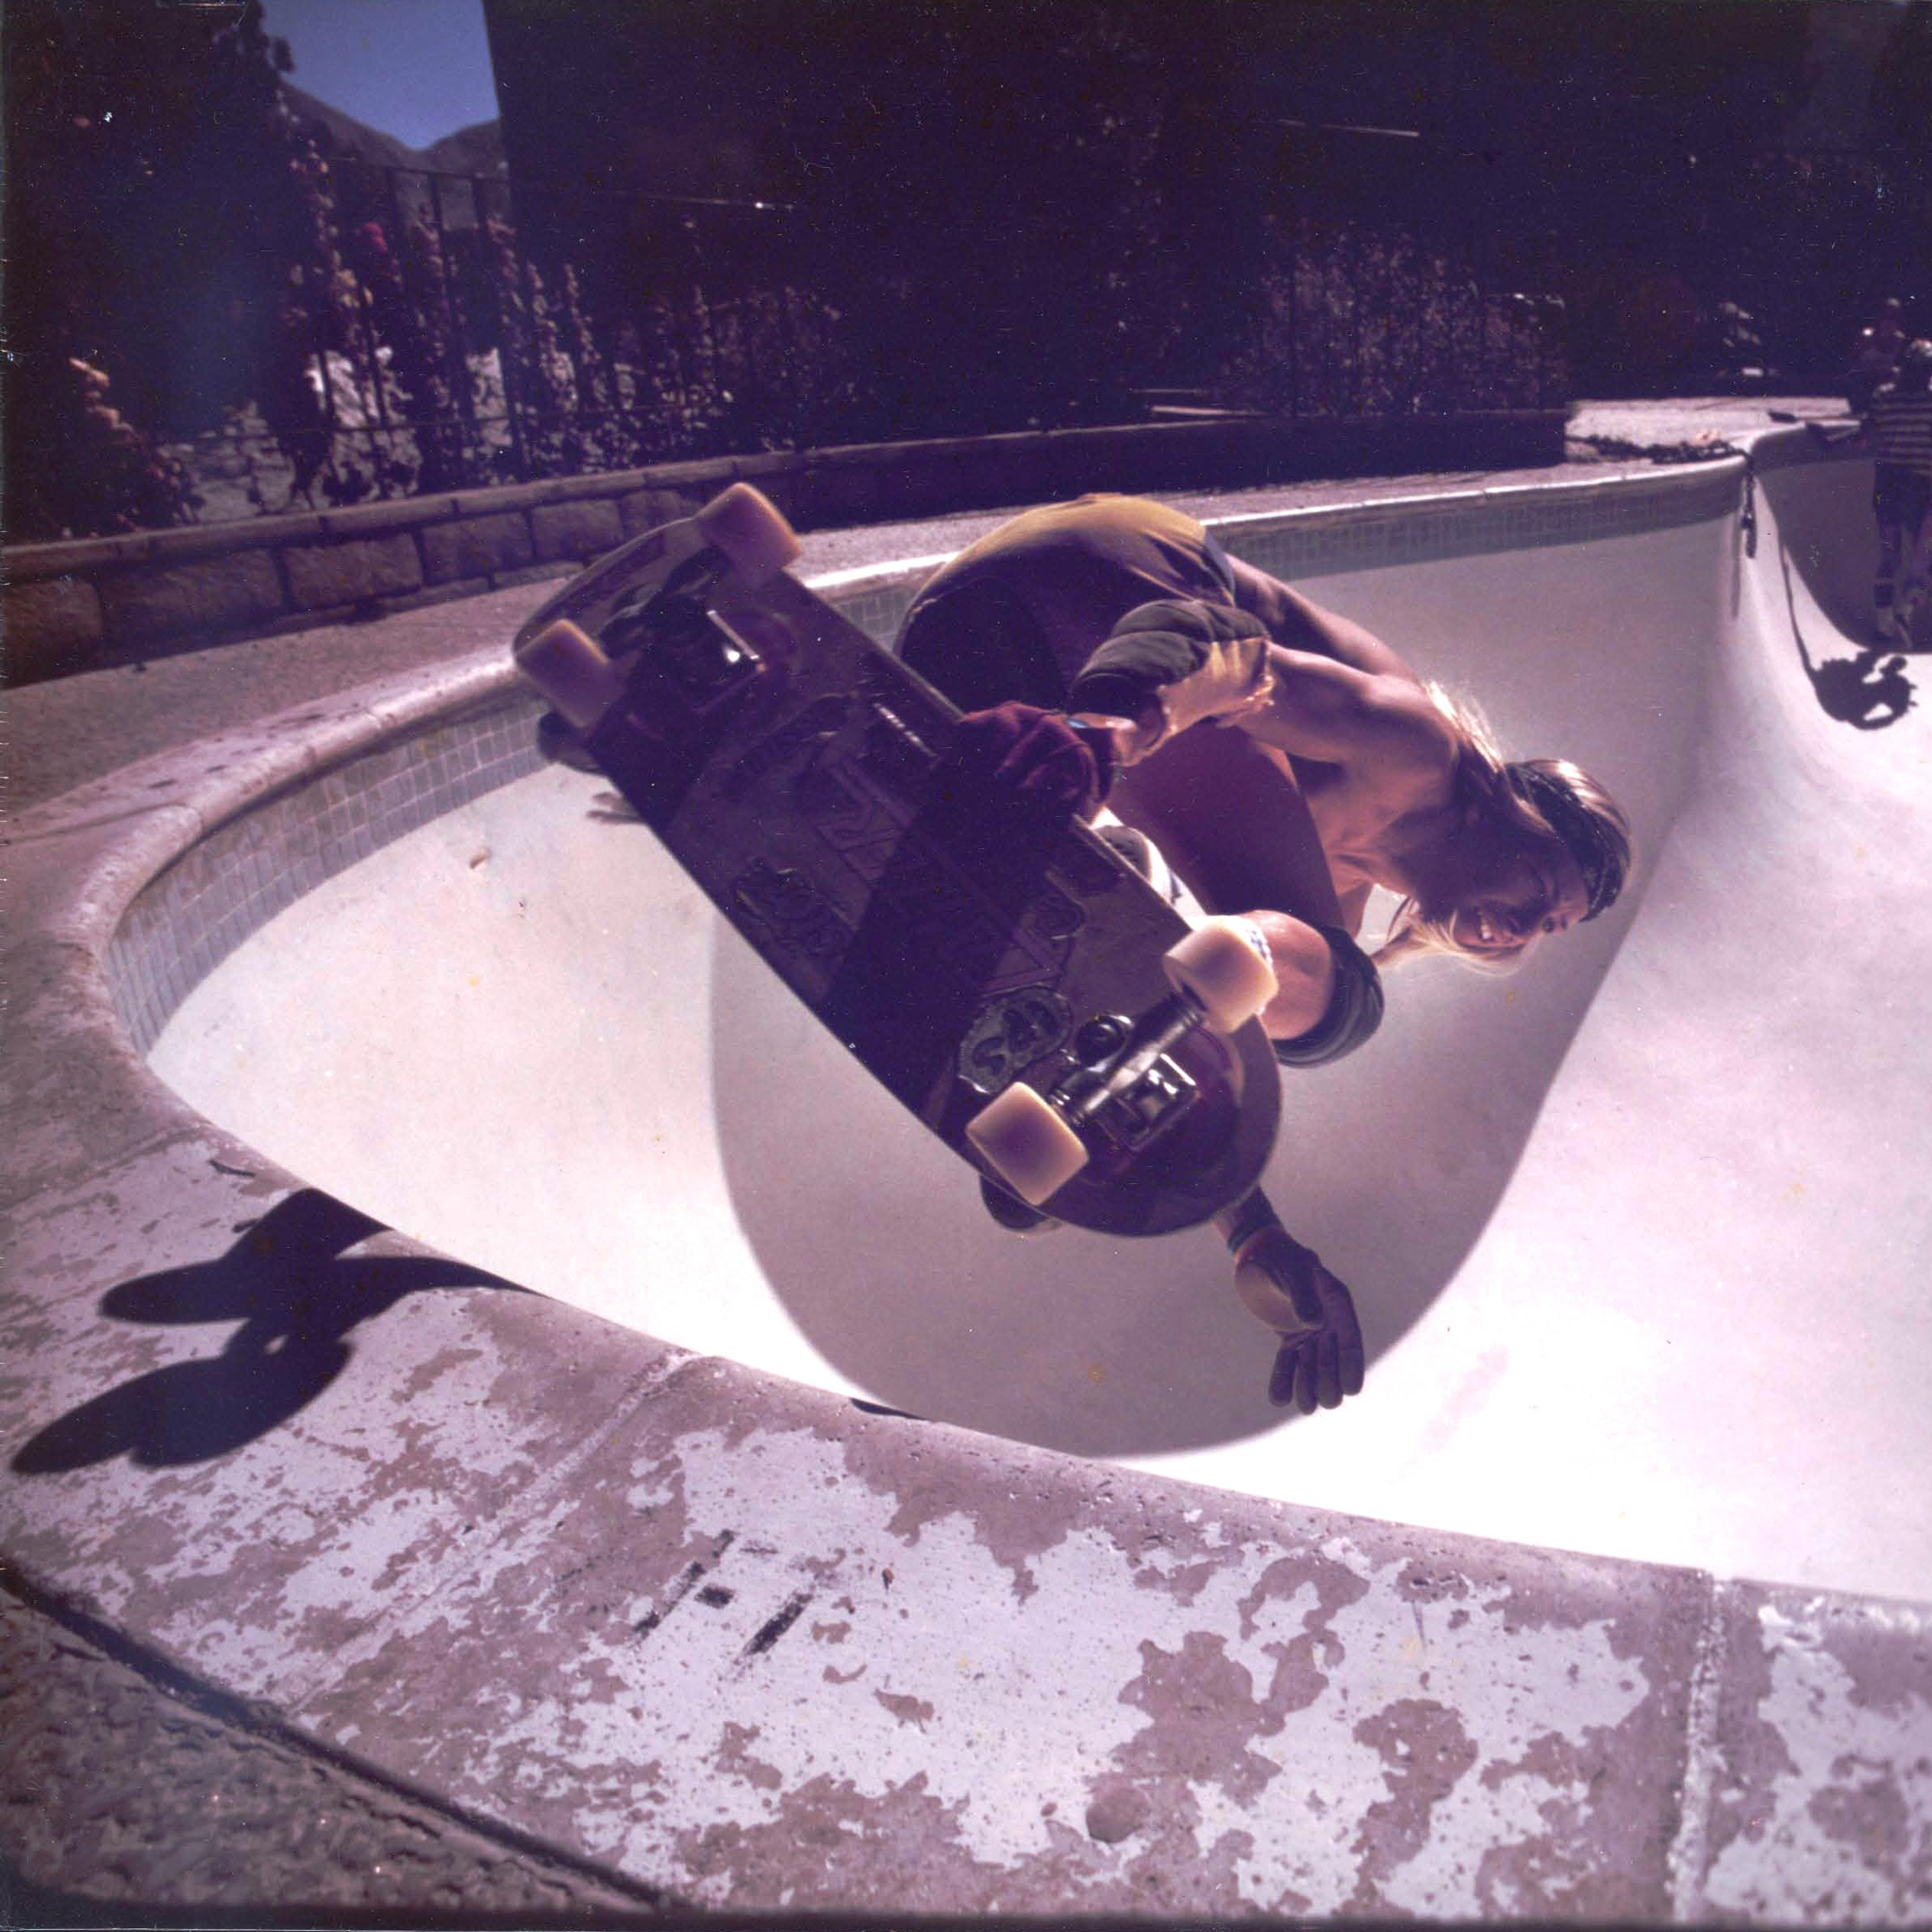 Pool Skate 3Wallpapers ipad Retina Pool Skate   iPad Retina